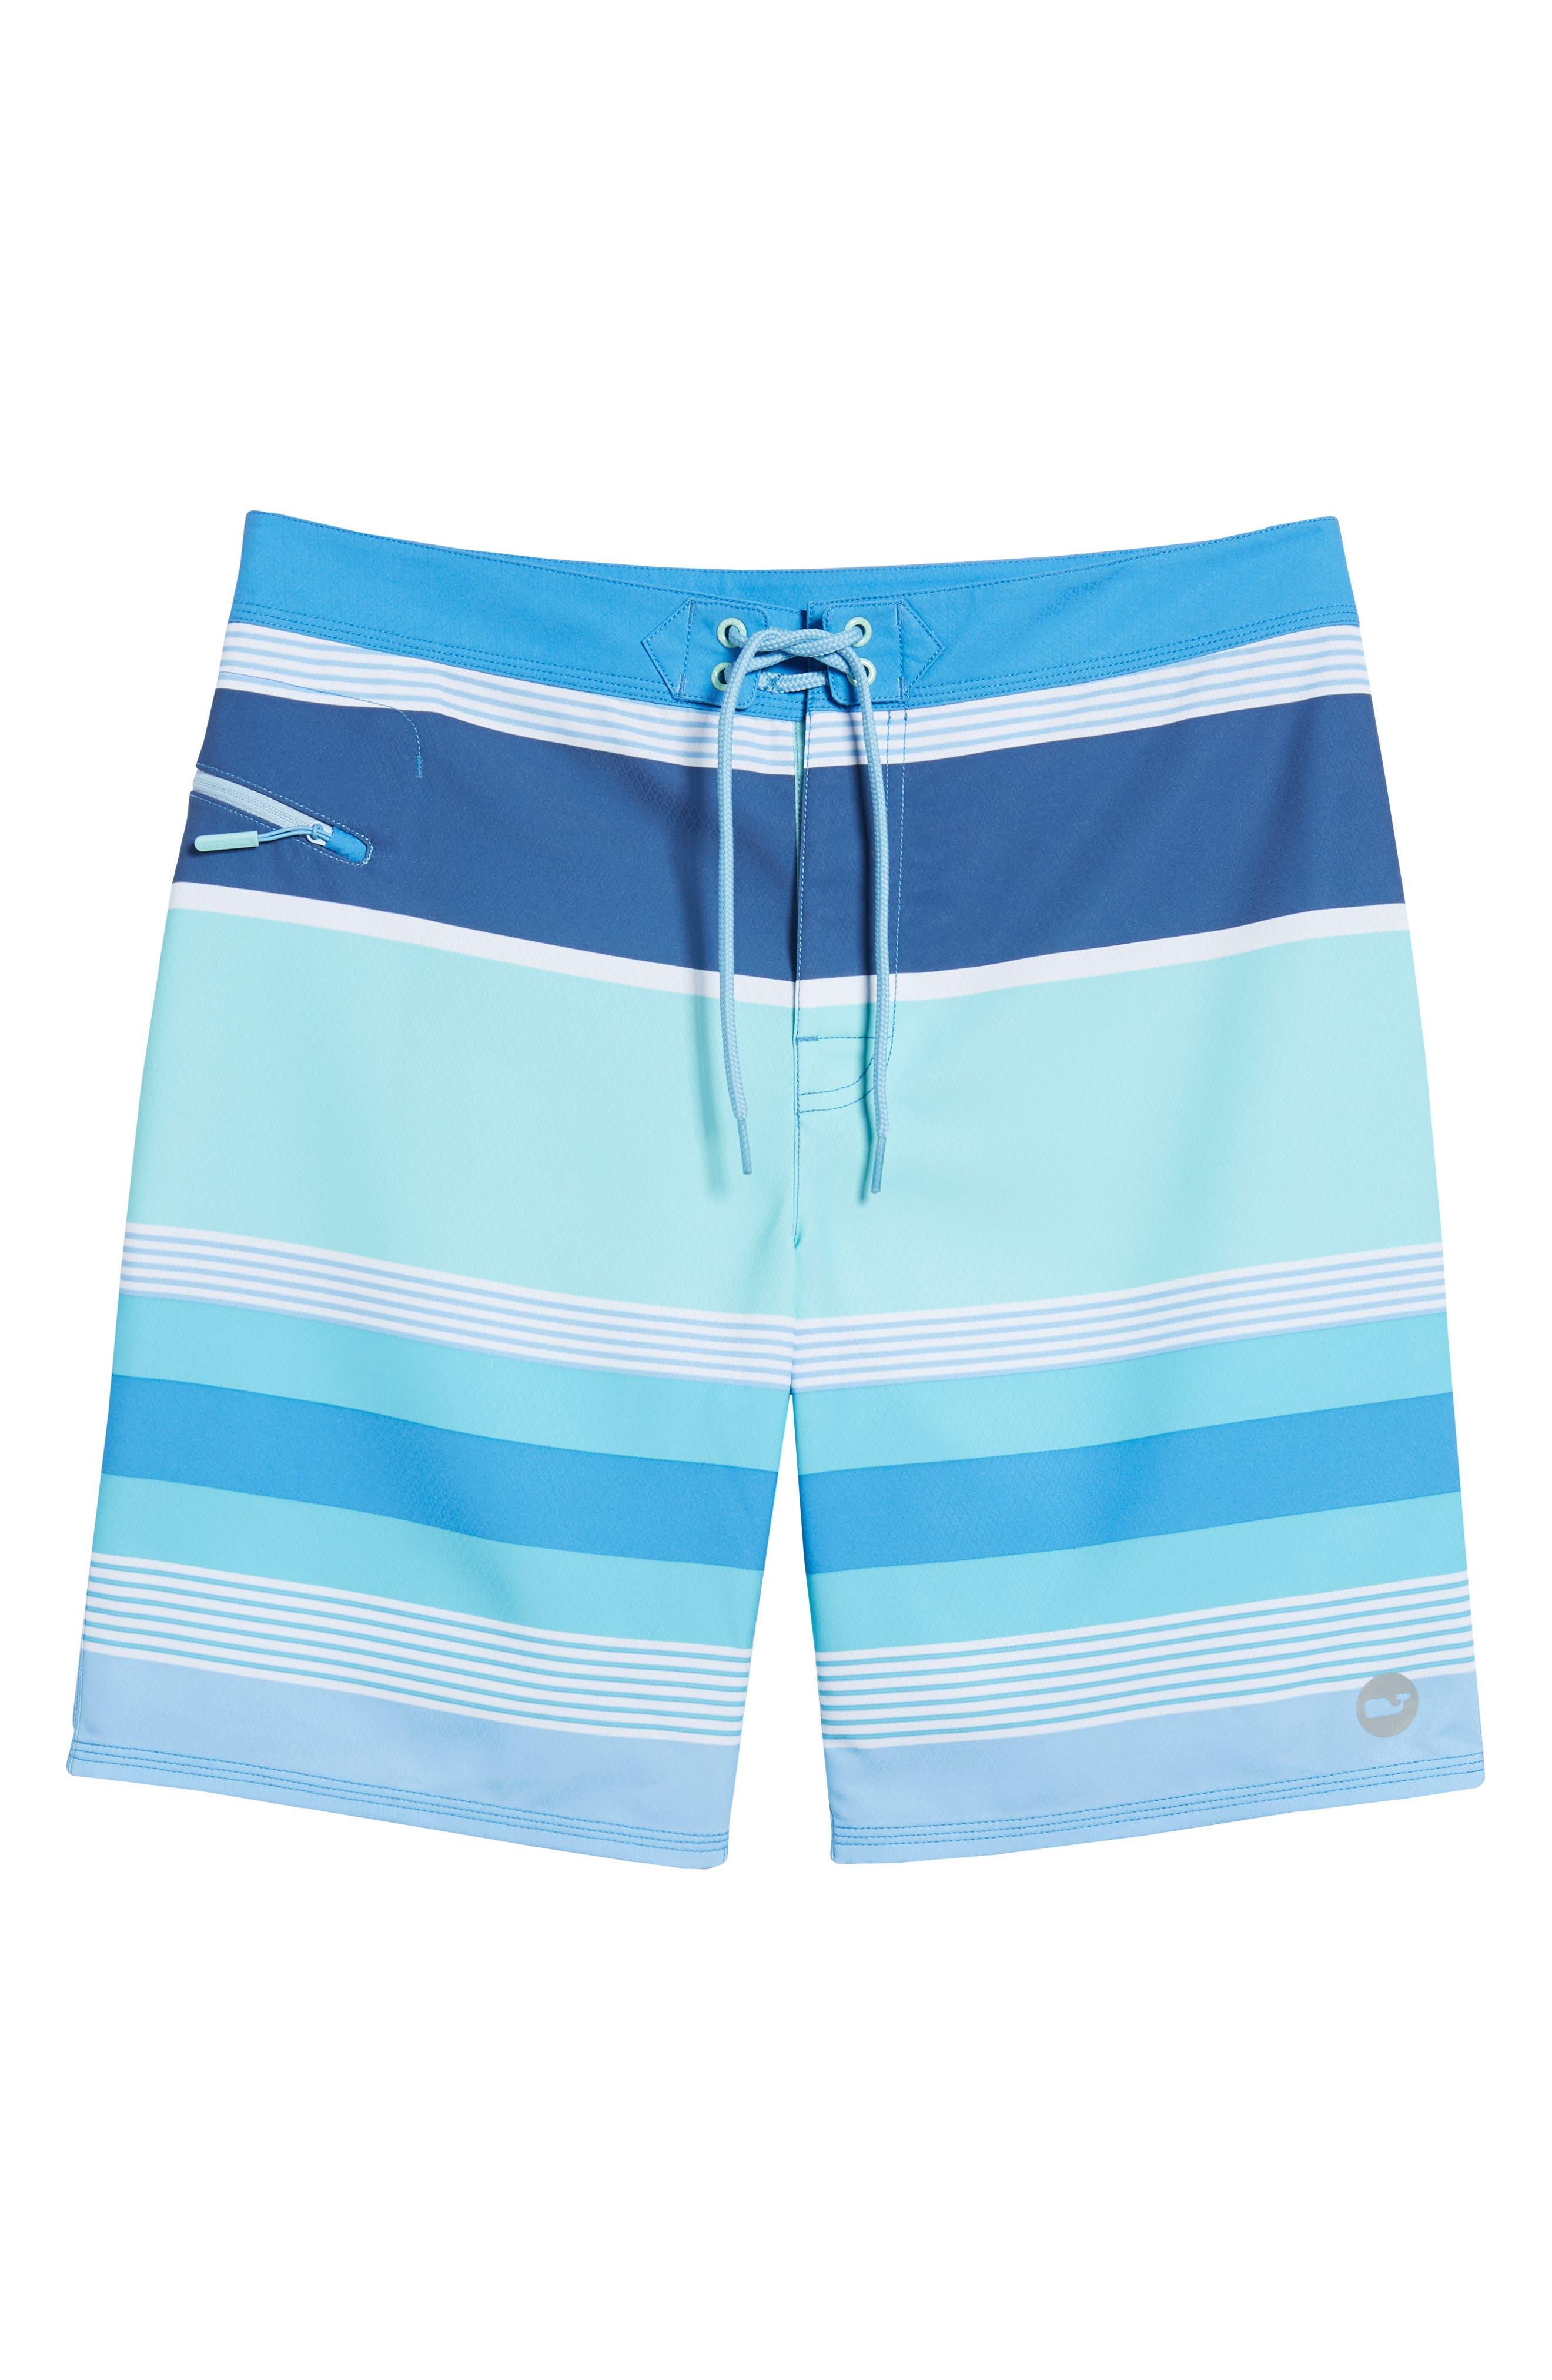 Peaks Island Board Shorts,                             Alternate thumbnail 6, color,                             Poolside